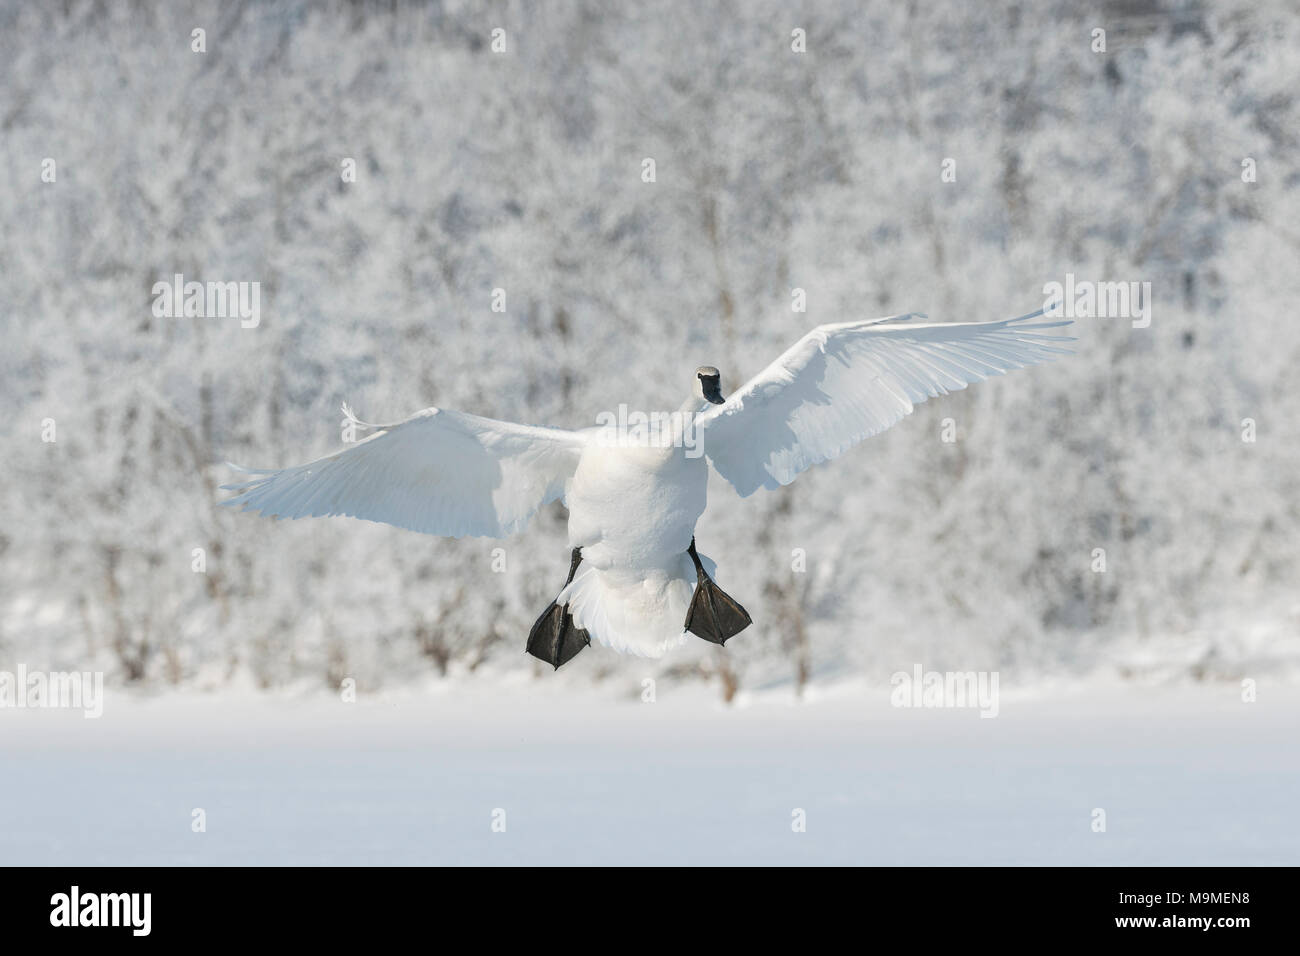 Ein trompeter Schwan (Cygnus buccinator) Landung auf dem gefrorenen St. Croix River, Hudson, WI, USA, Anfang Januar, von Dominique Braud/Dembinsky Foto Assoc Stockbild